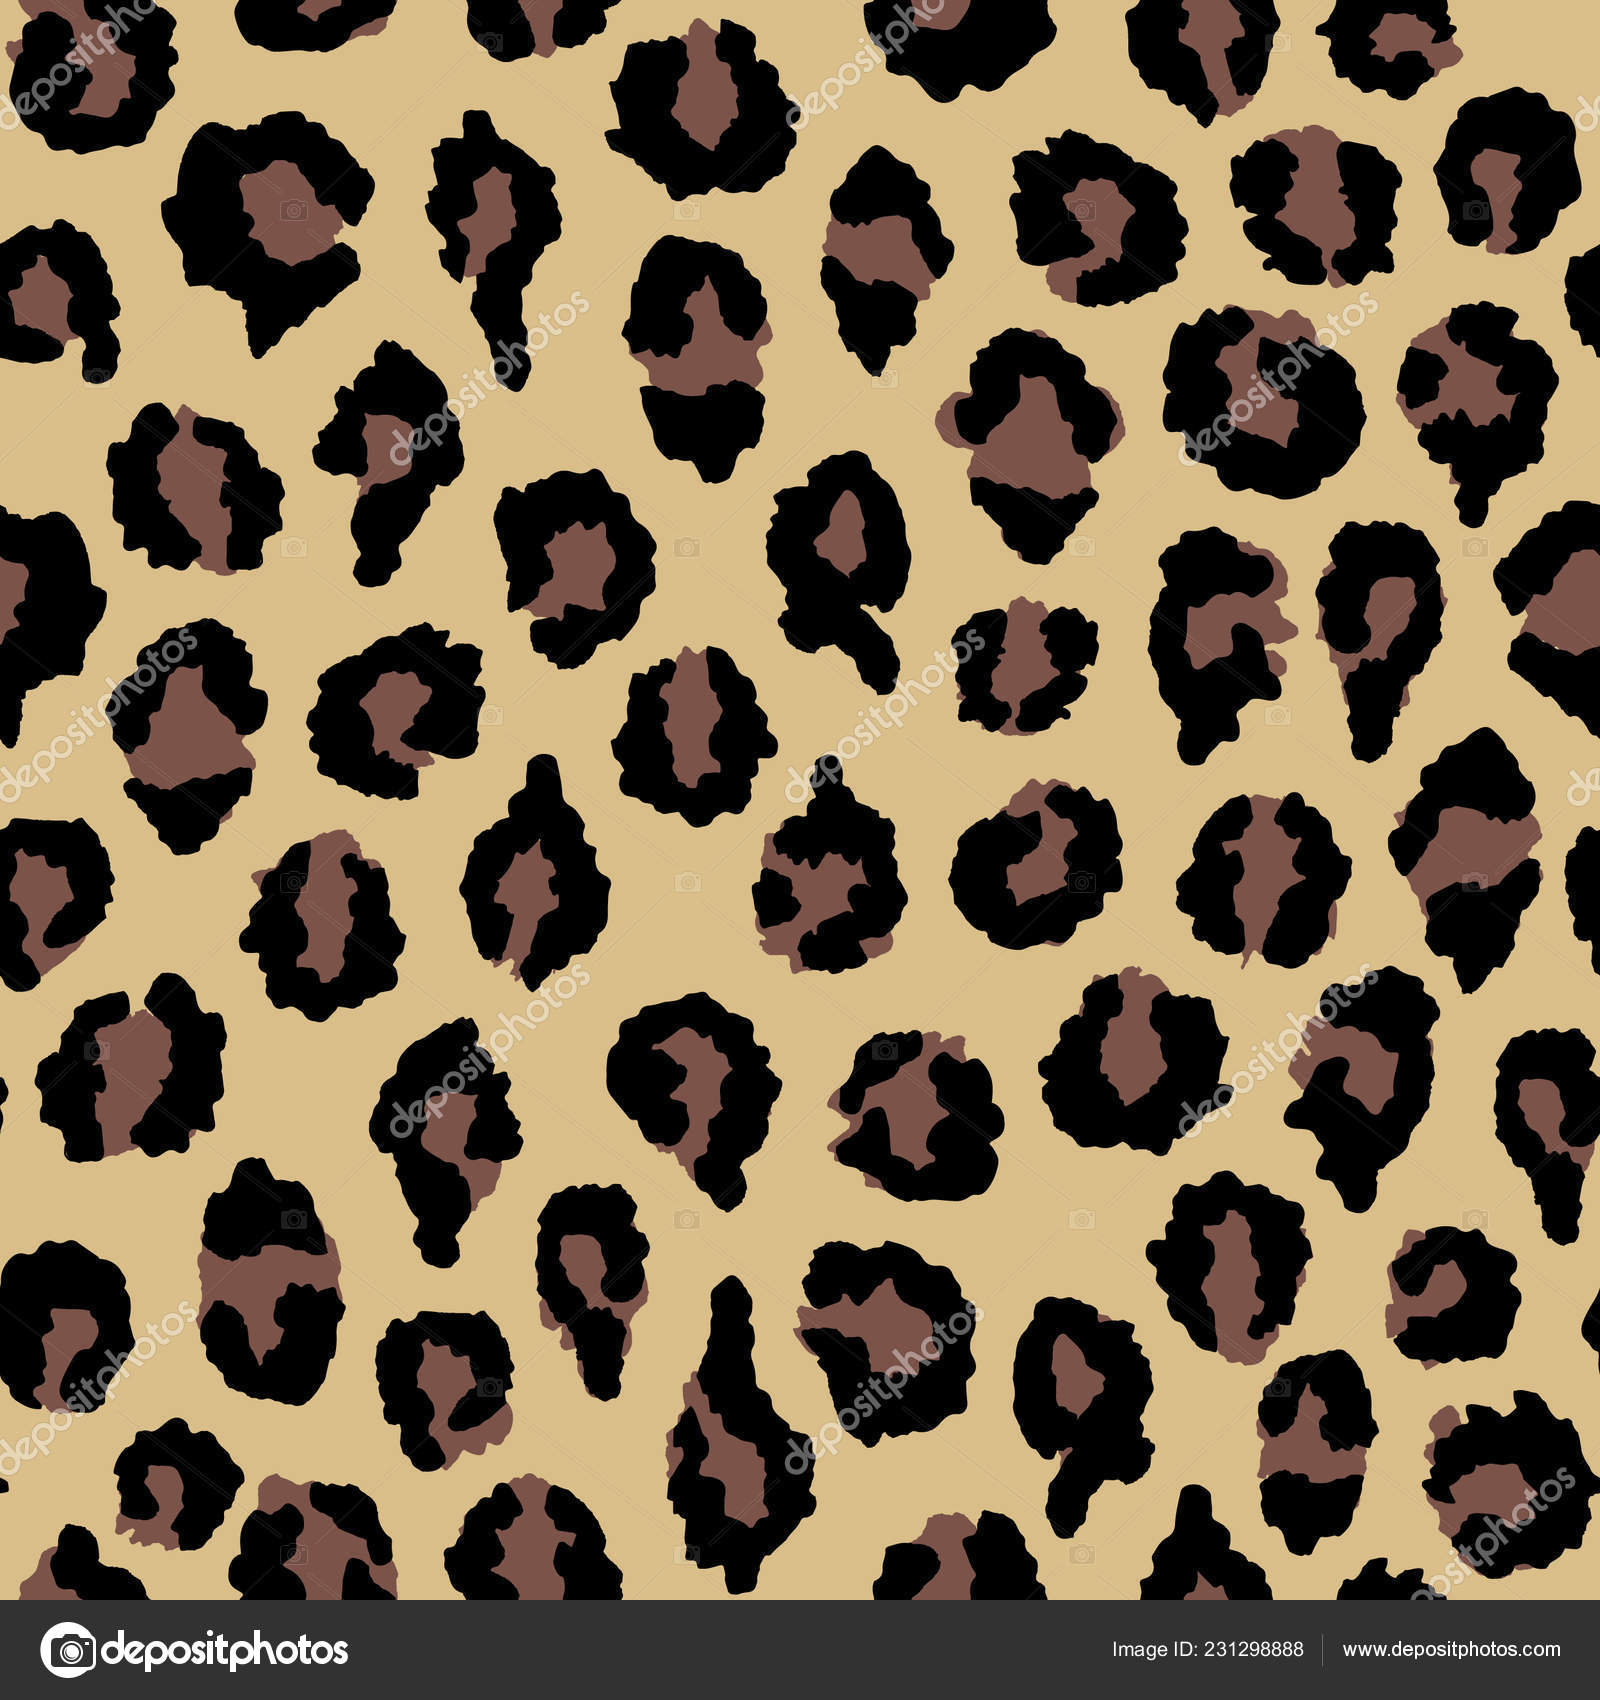 Textured Animal Print Wallpaper Seamless Pattern Leopard